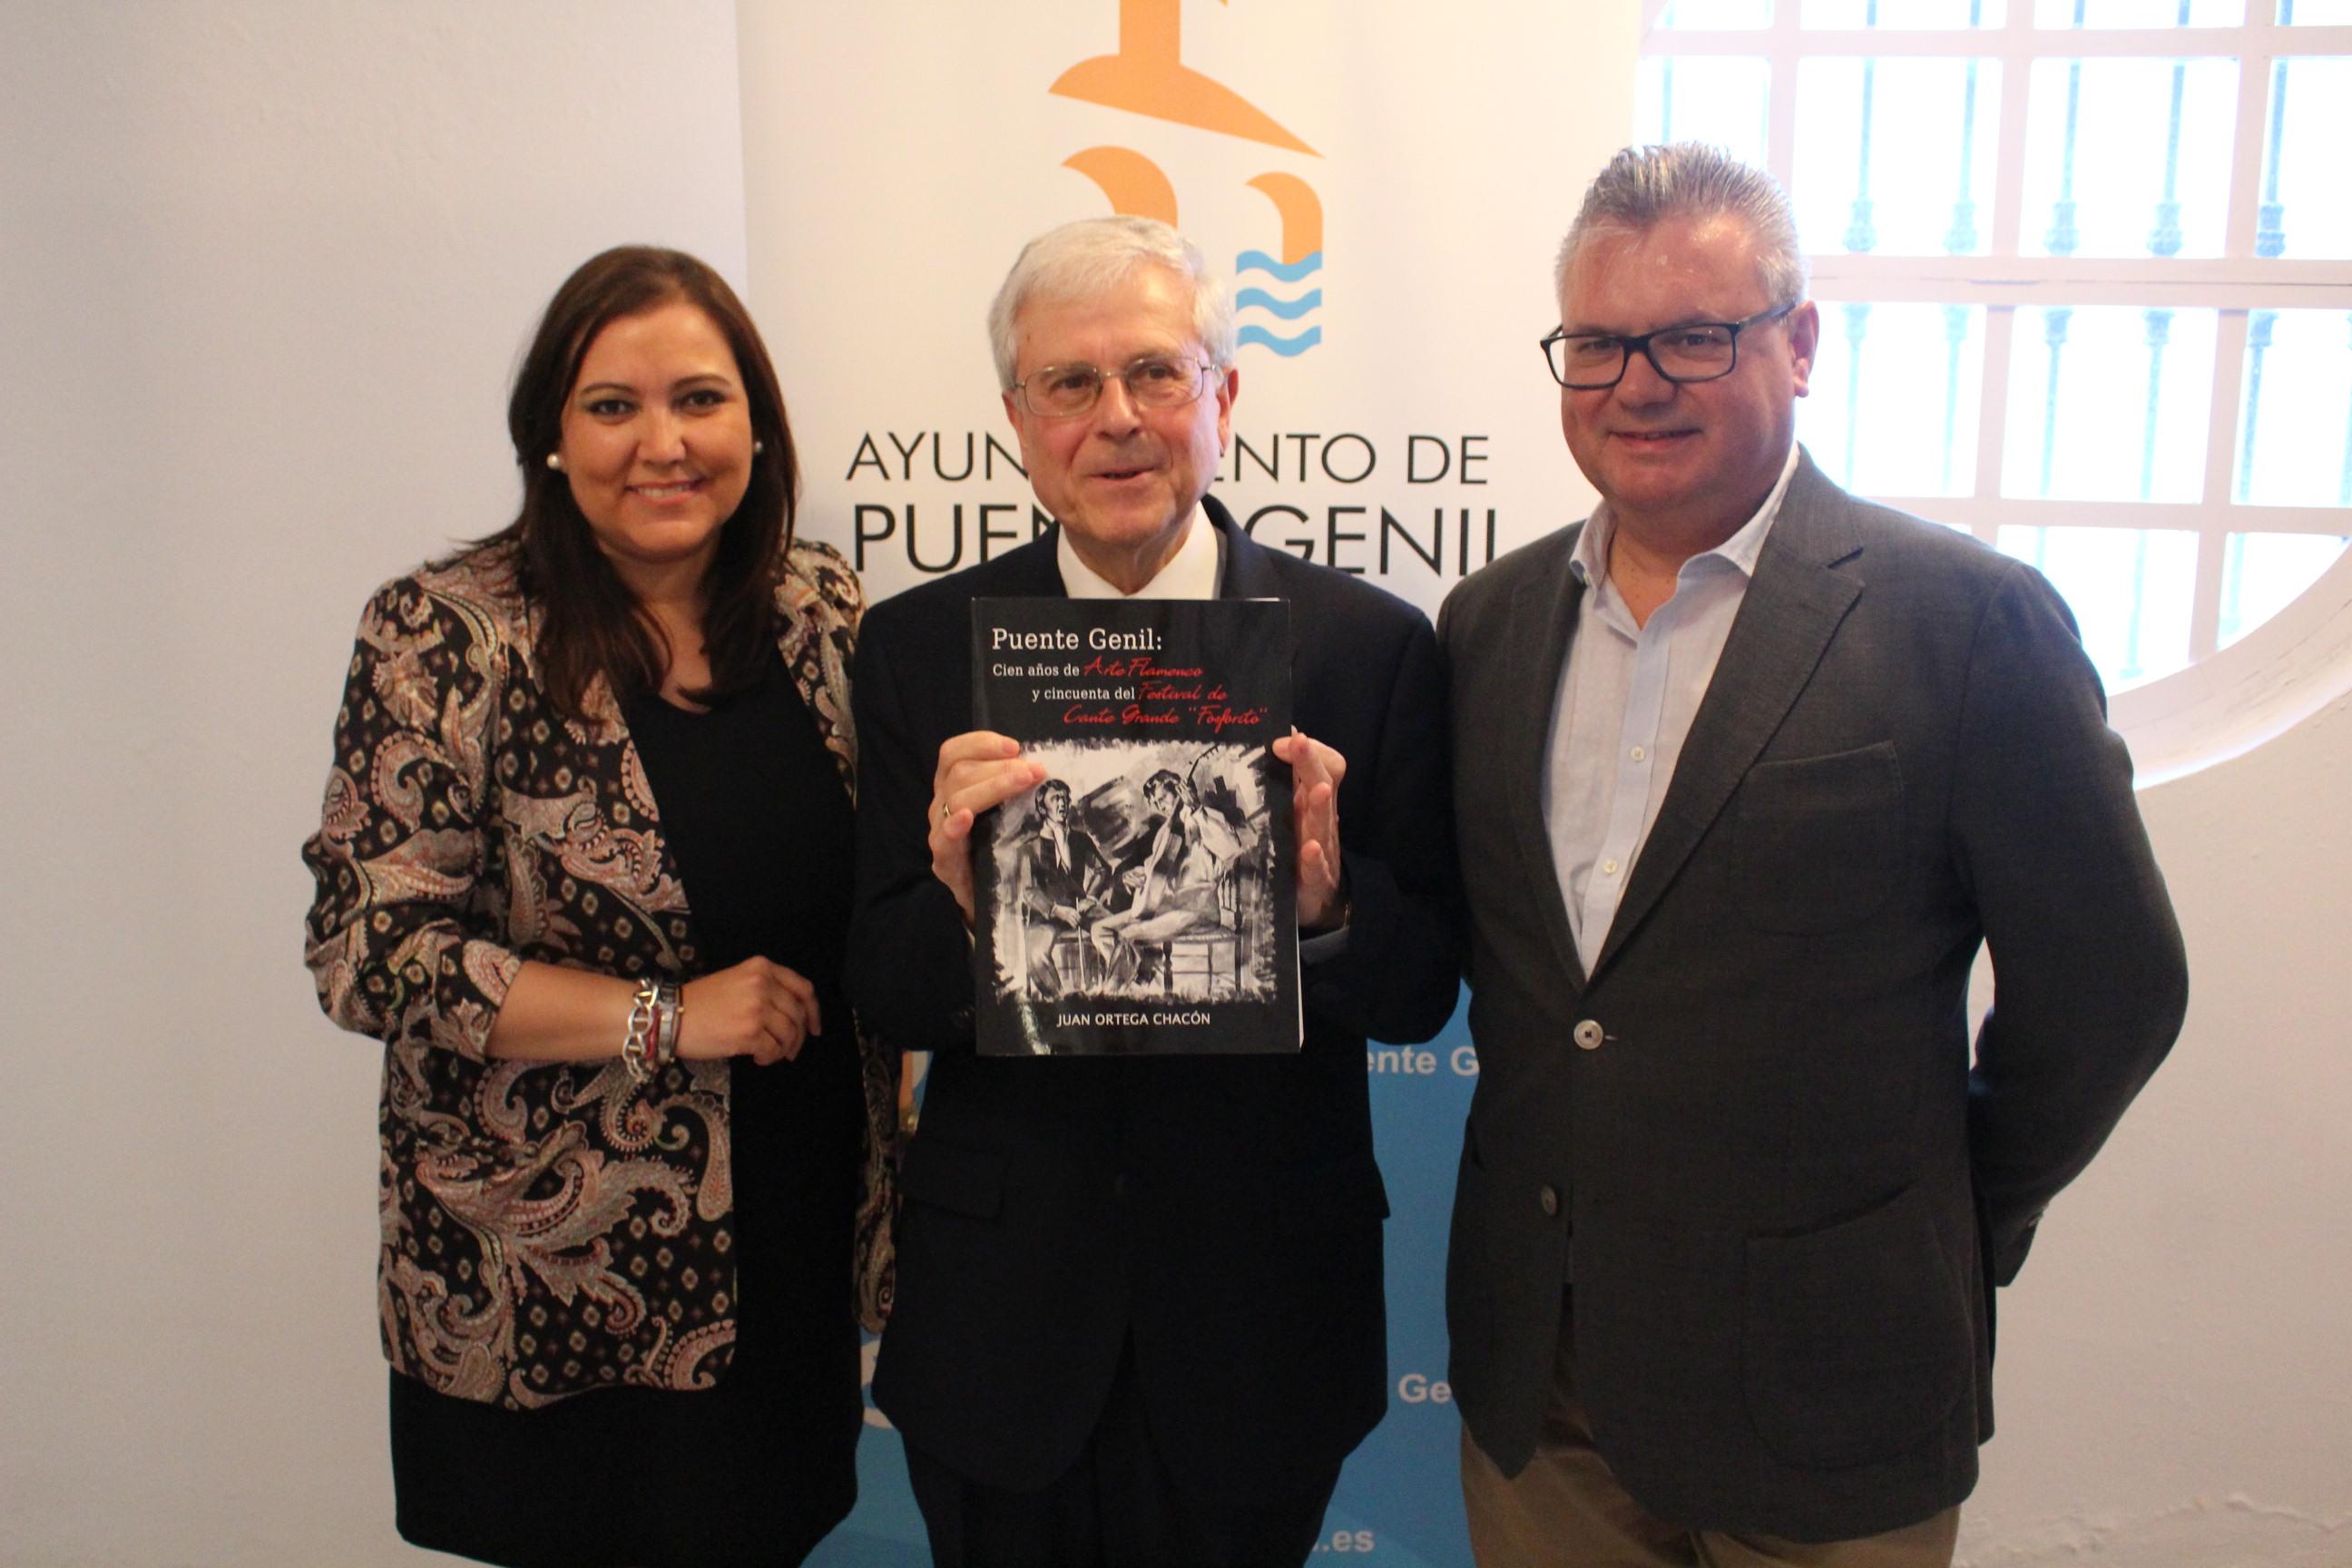 Juan Ortega presenta una gran obra que recoge la historia del flamenco en Puente Genil